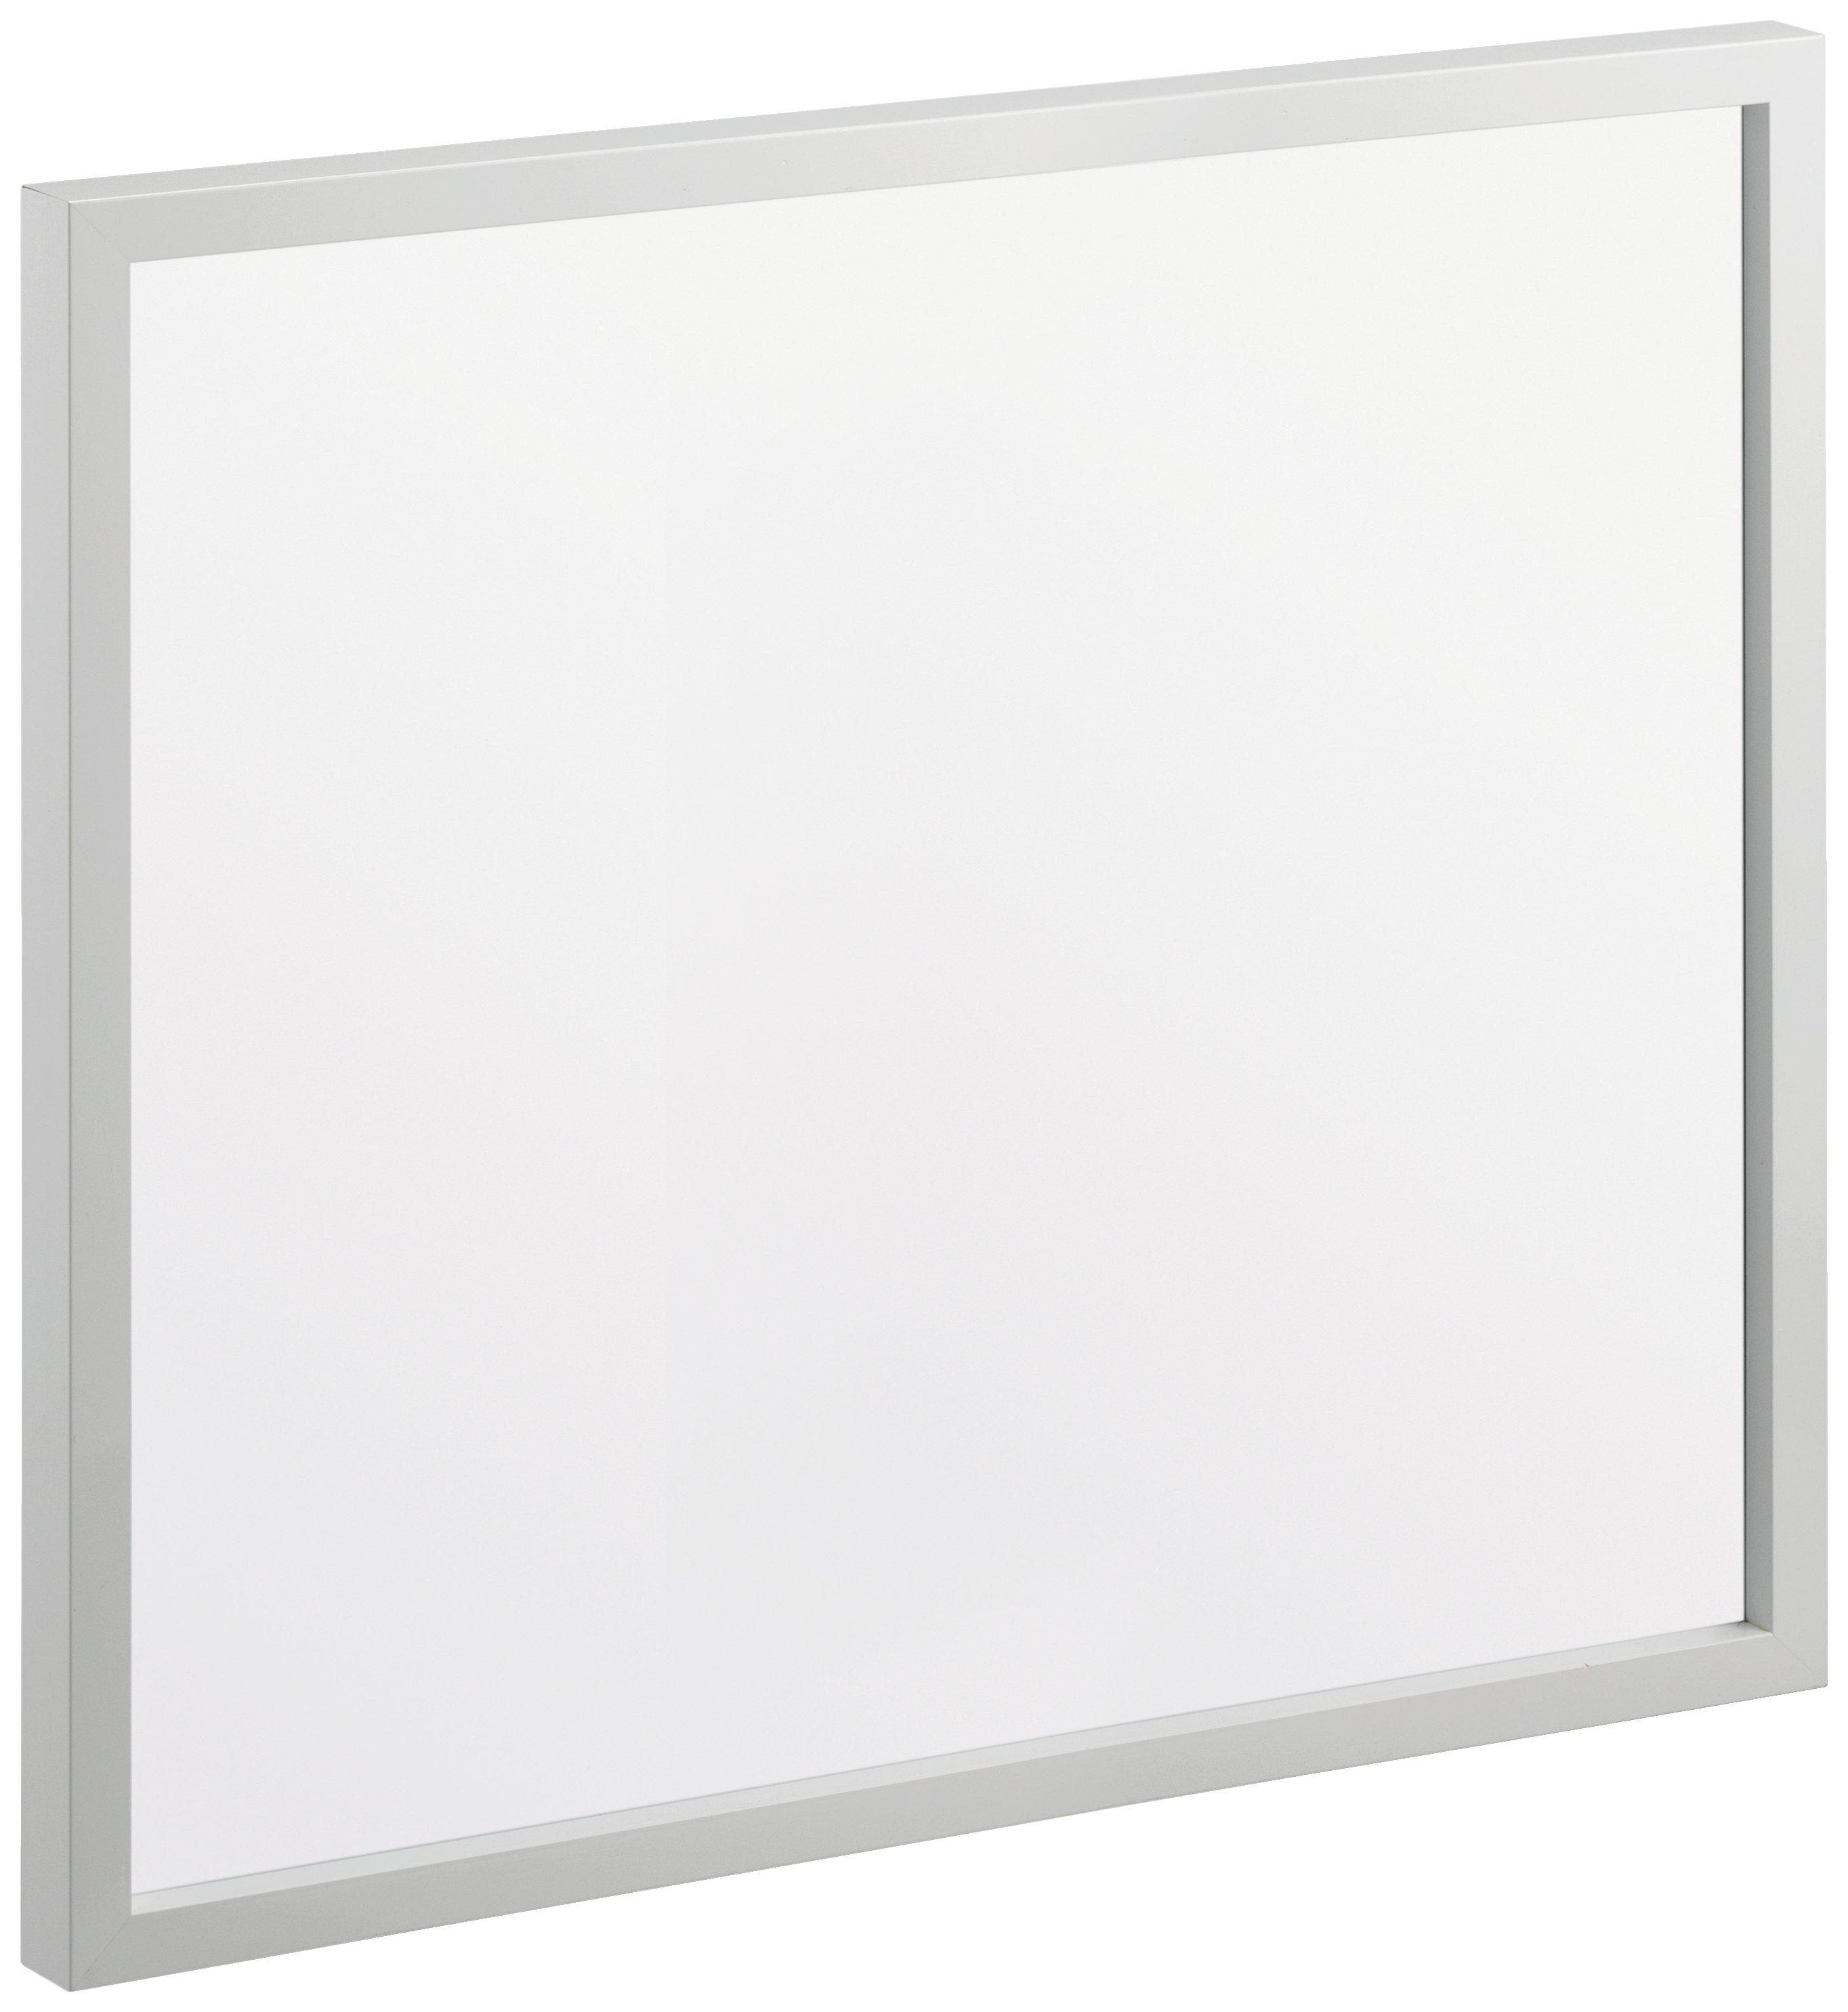 Habitat Bacall 50x50cm Wall Frame - Gloss White.